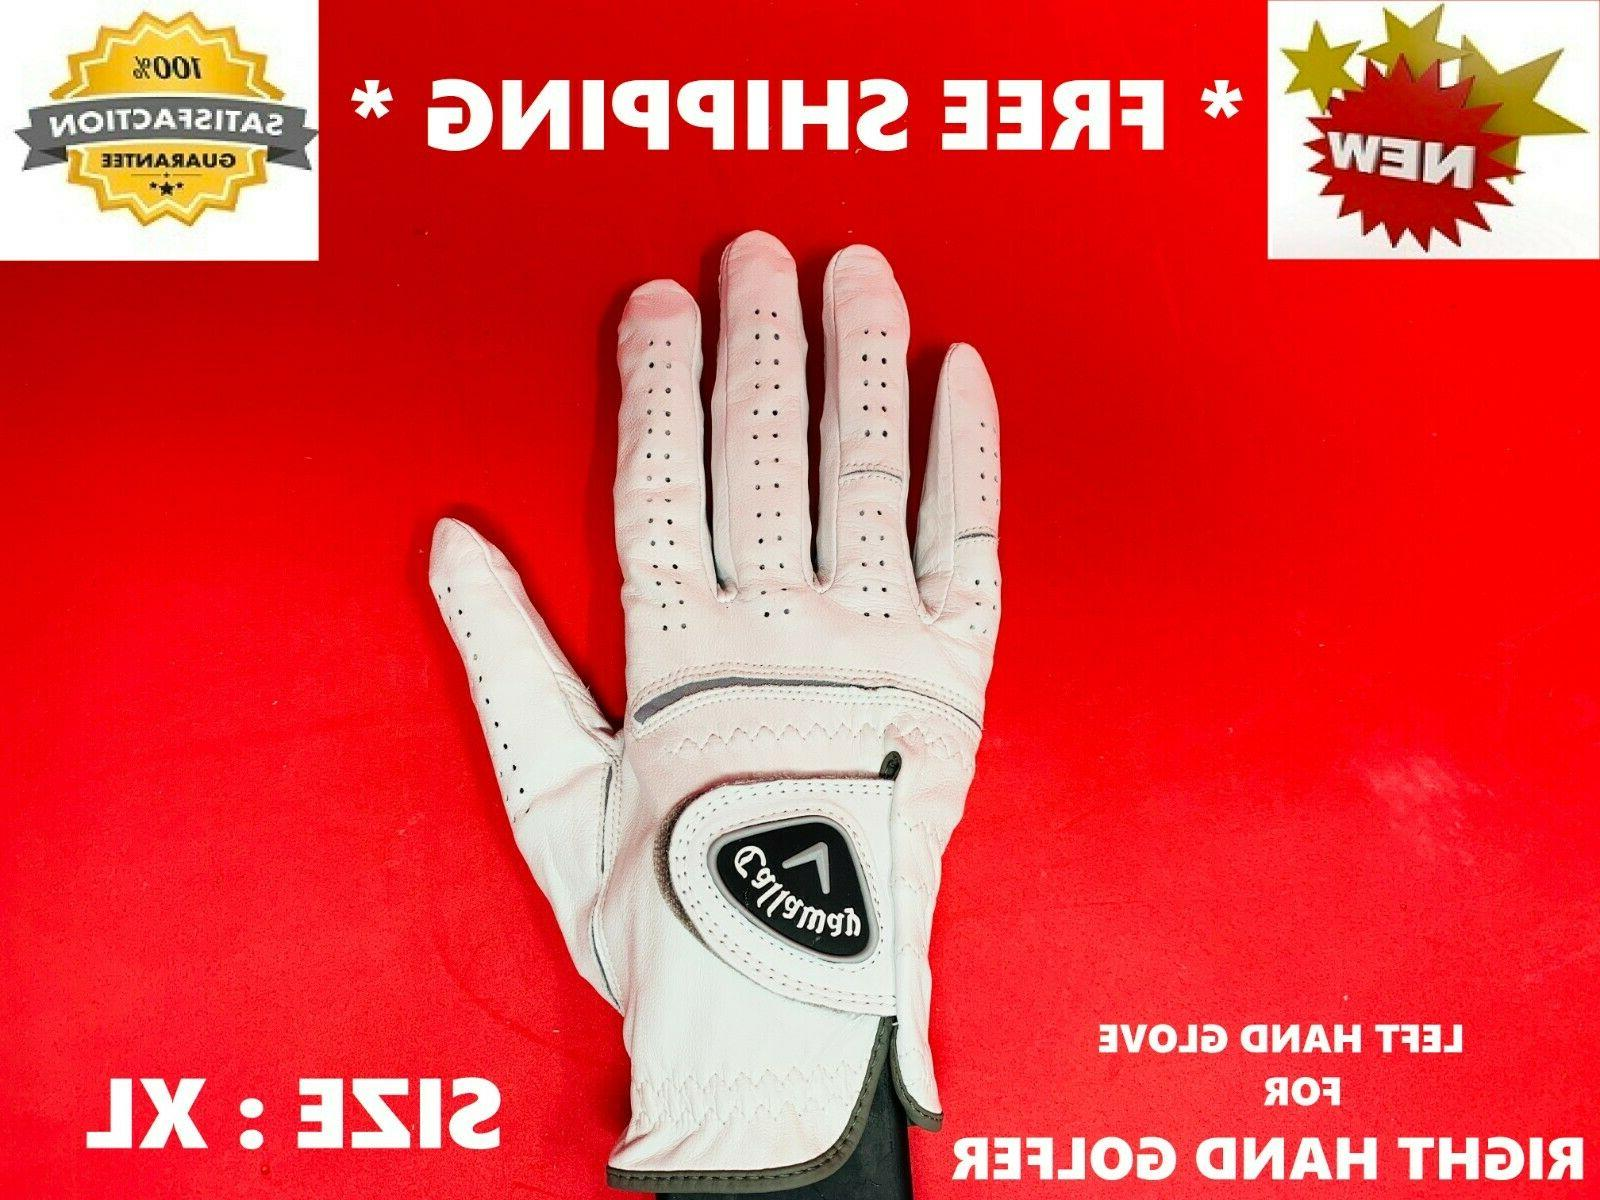 brand new genuine mens left hand breathable